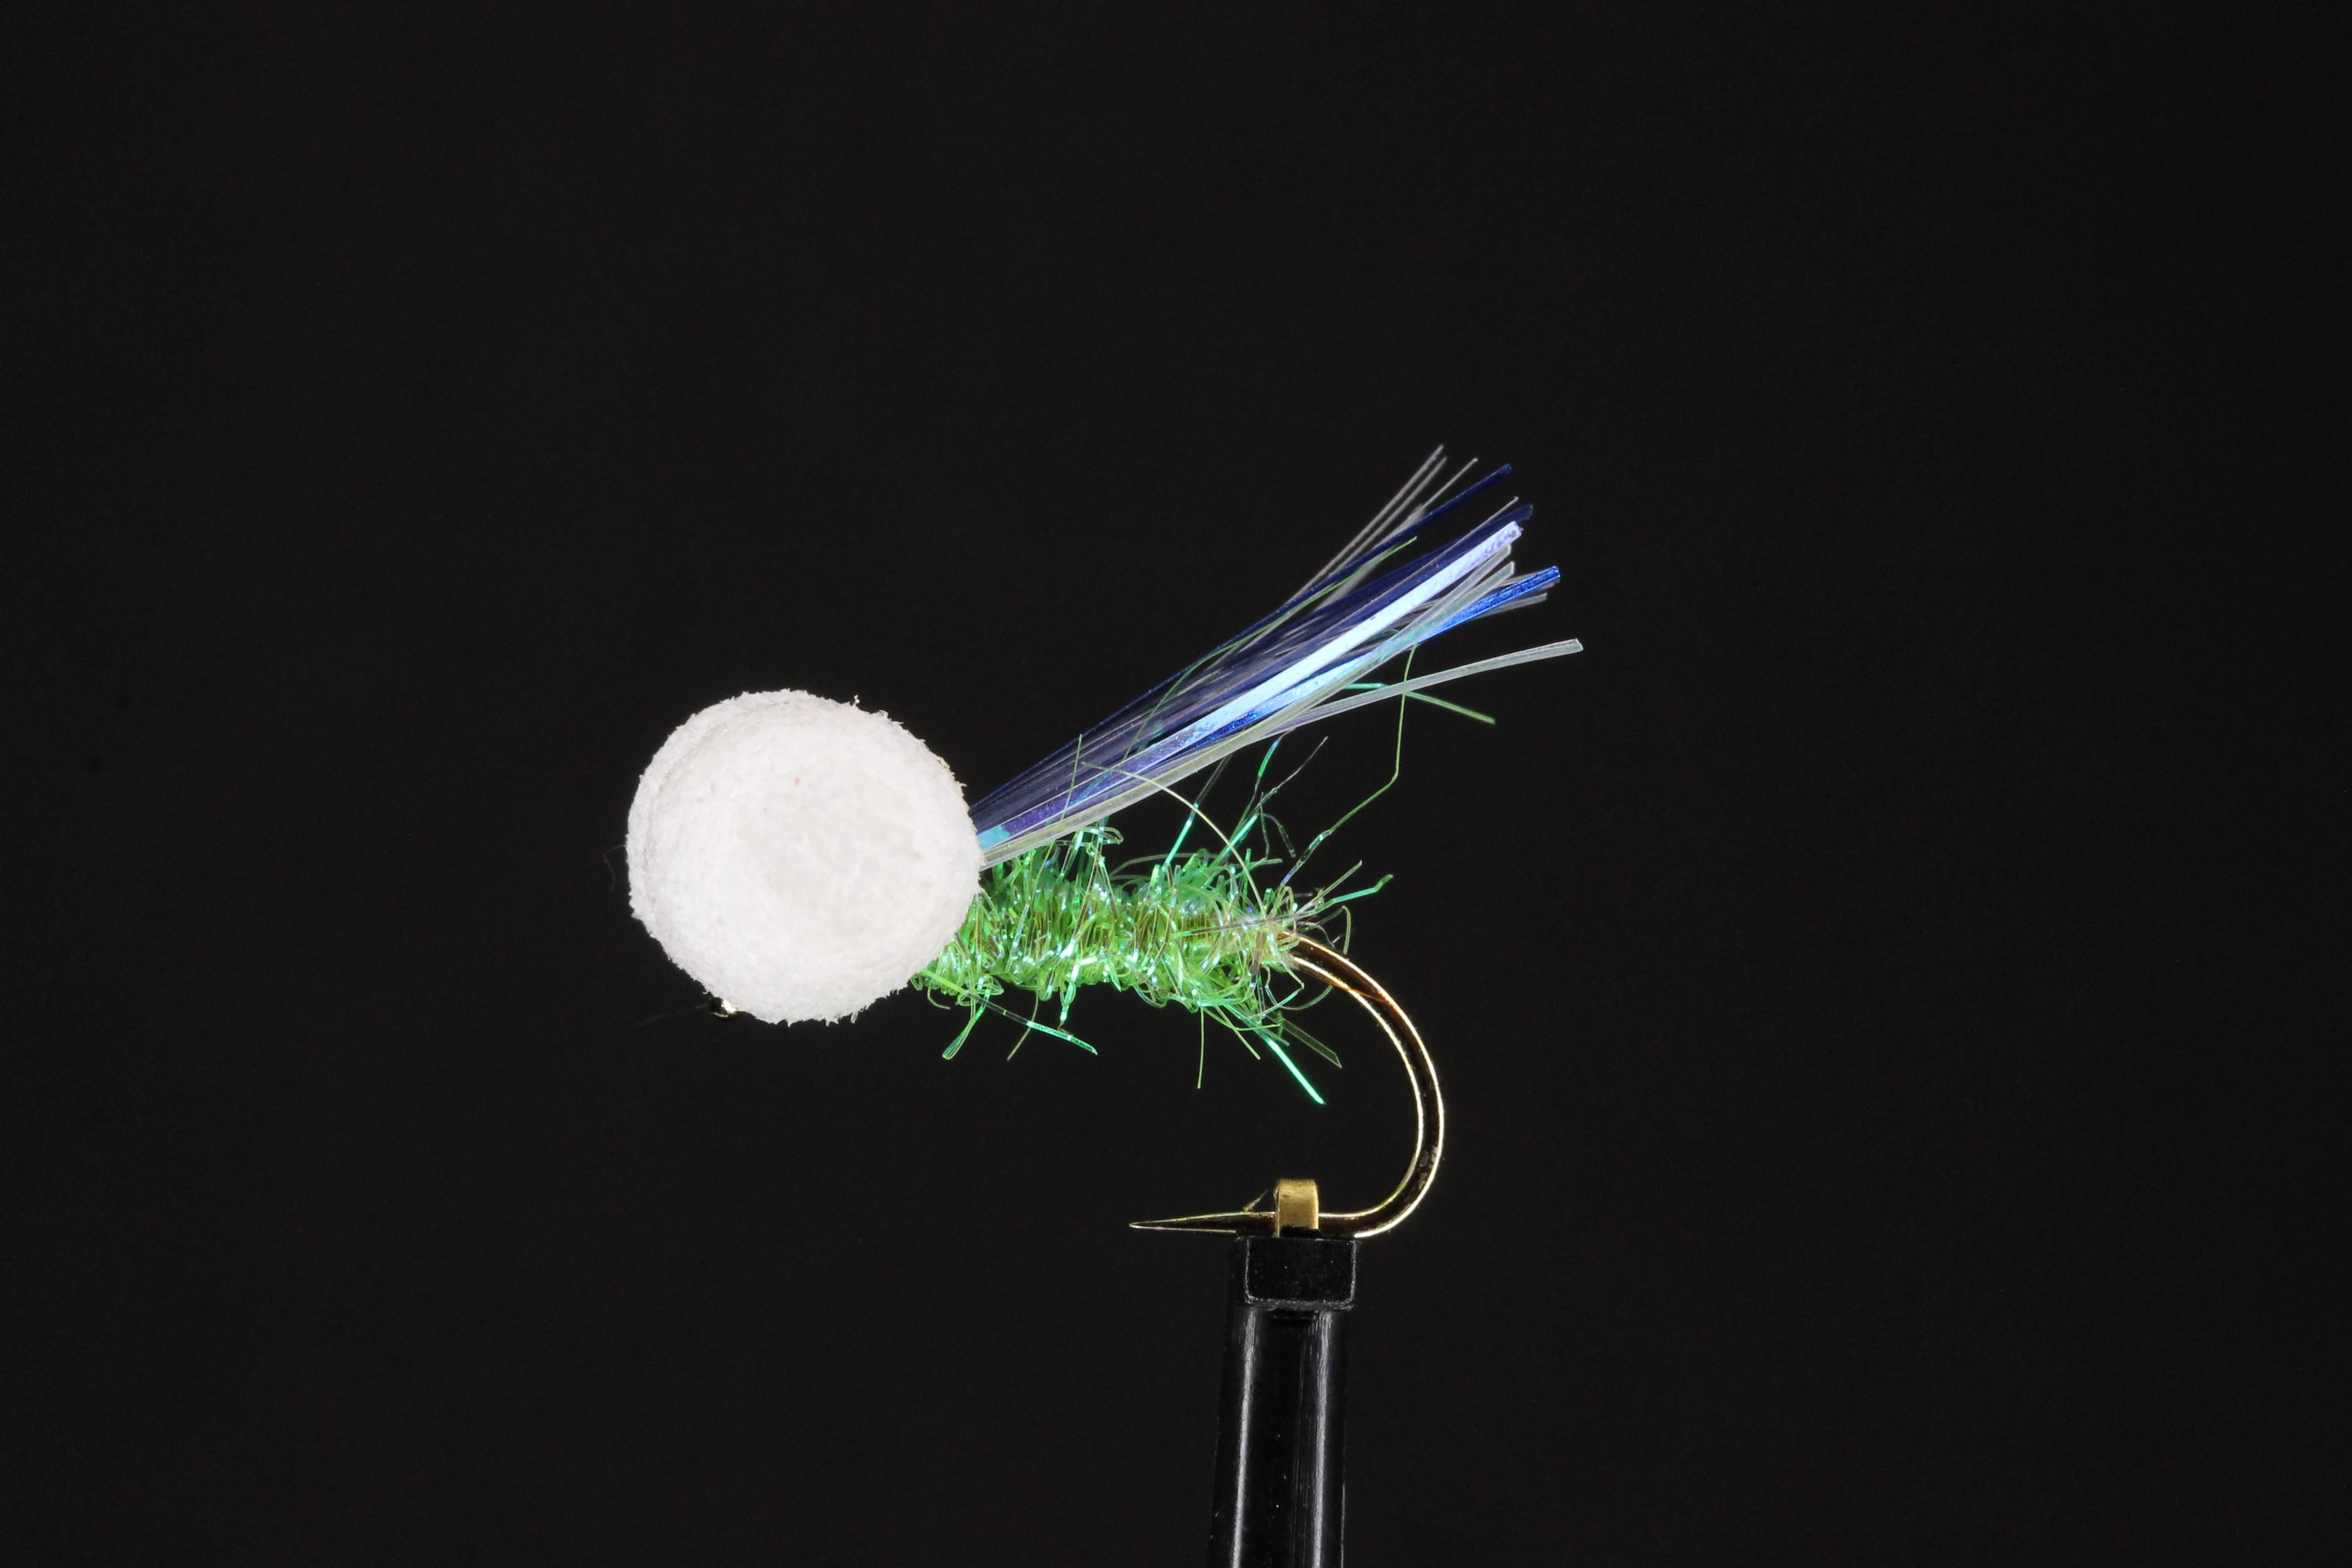 Dynamite Booby - White & Lime